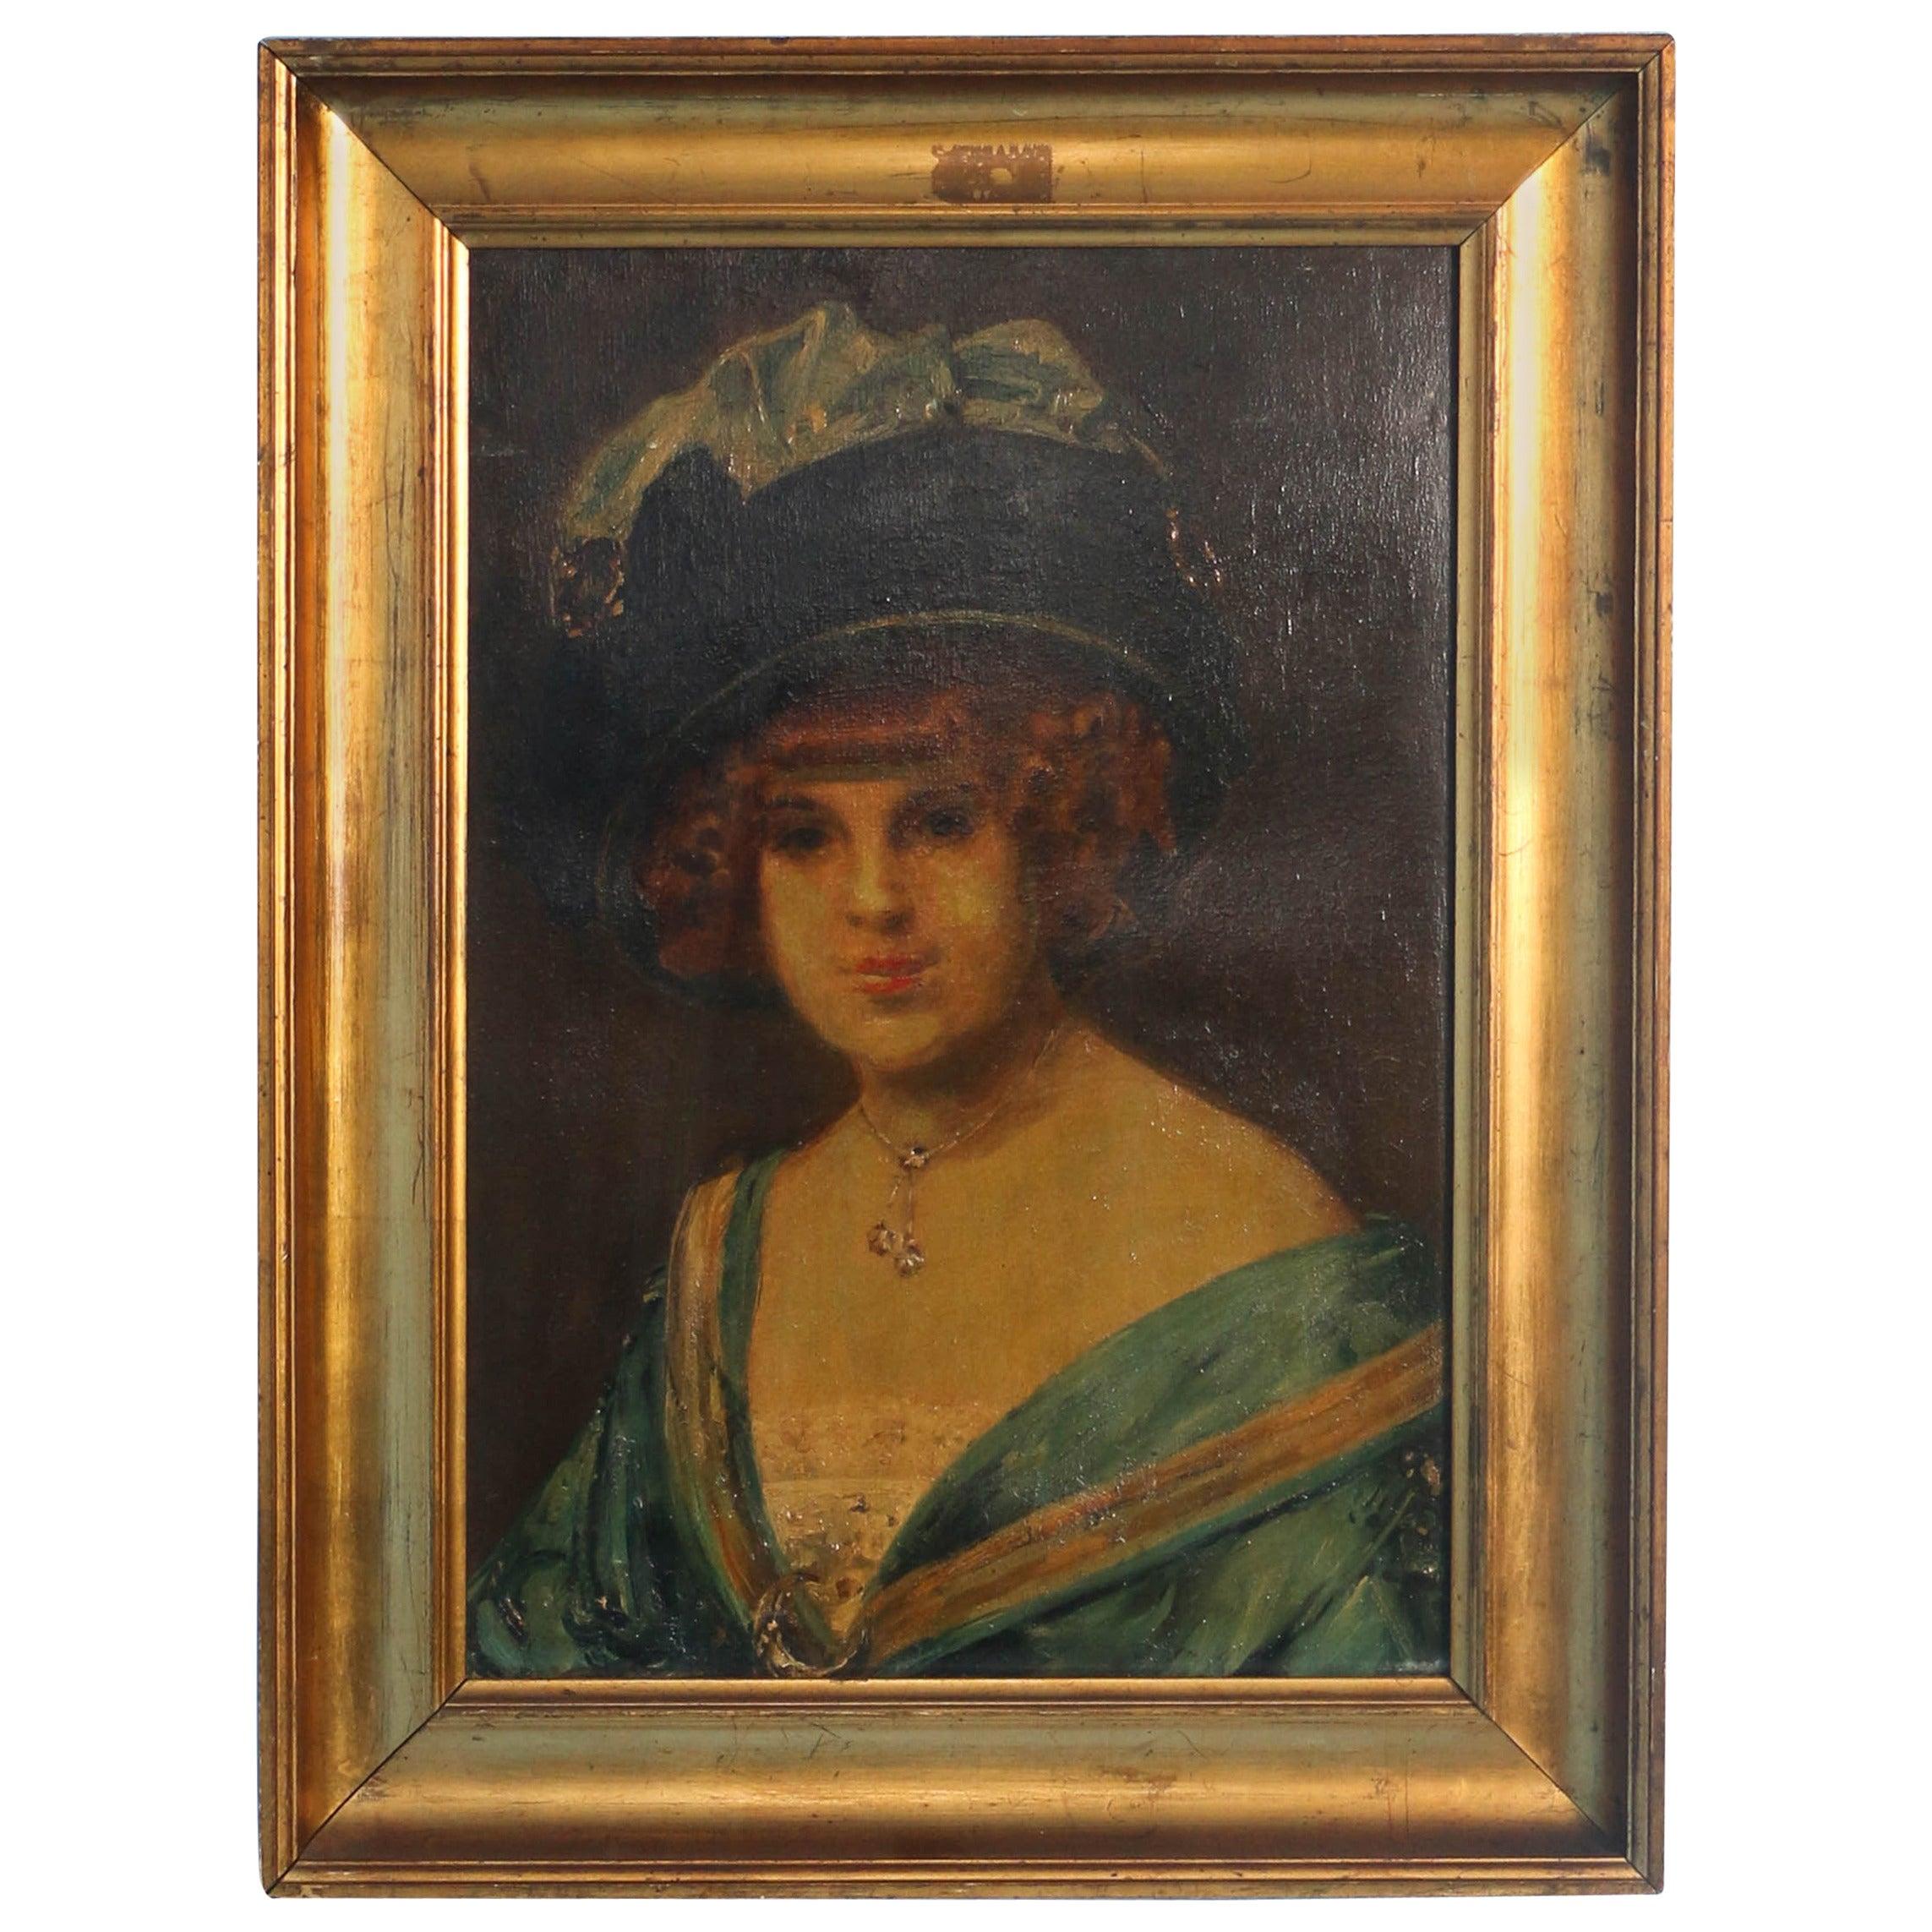 "Original Oil on Canvas Portrait of Woman,""Edith"", by Holger Drachmann"